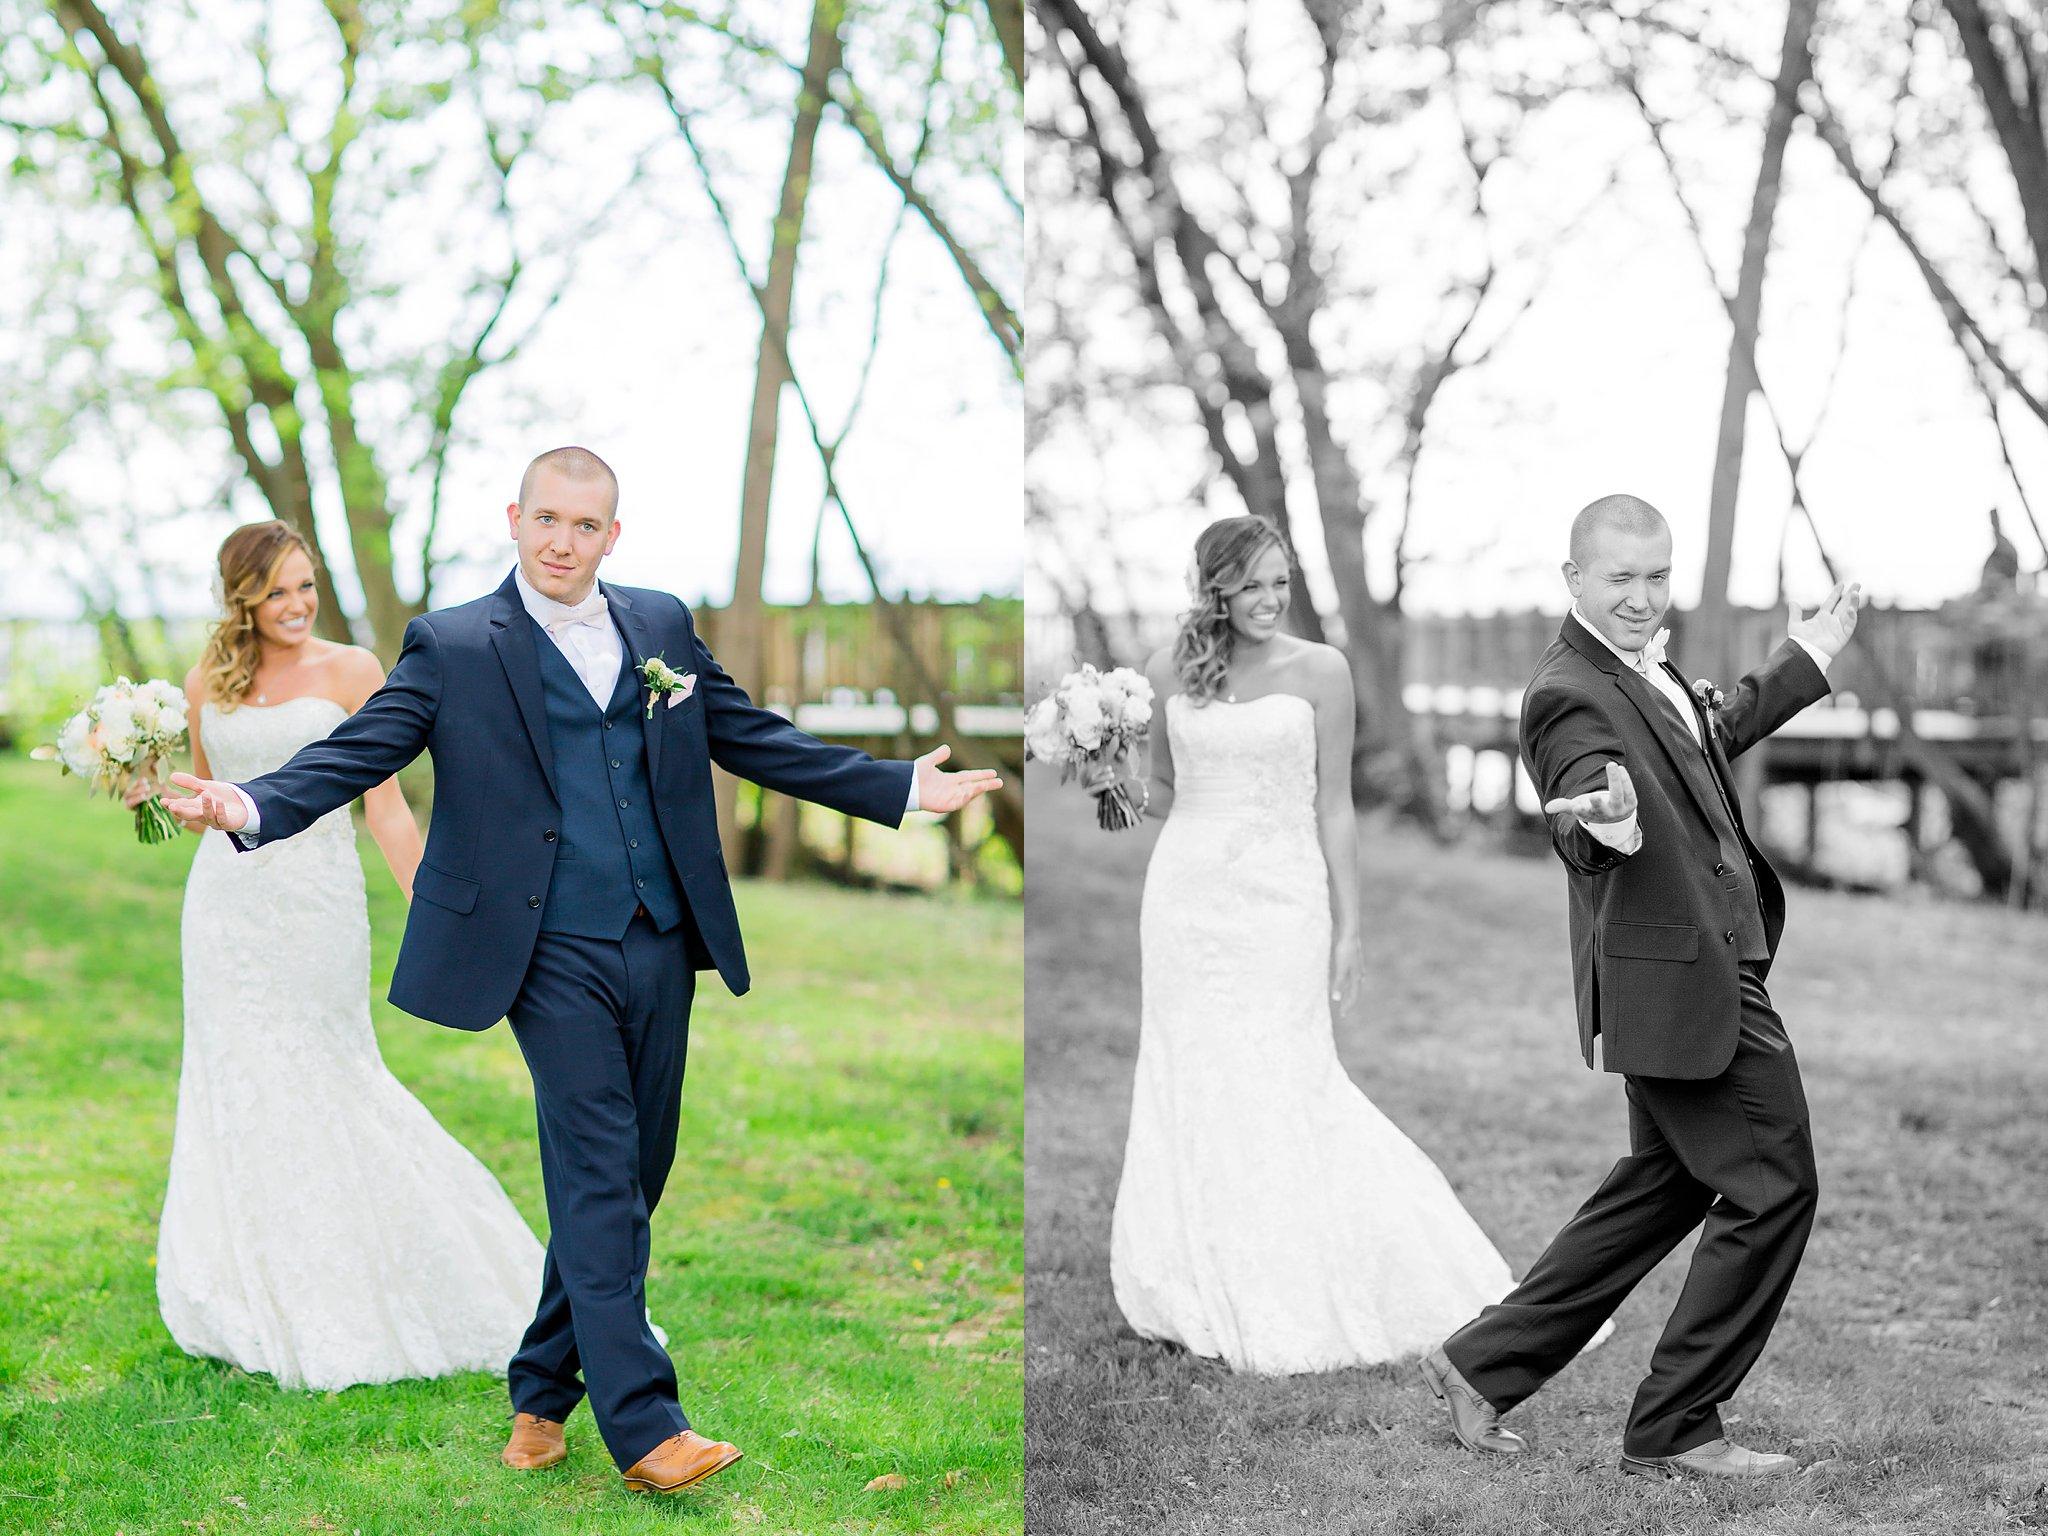 Spring Hill Manor Wedding Photos Maryland Wedding Photographer-56.jpg